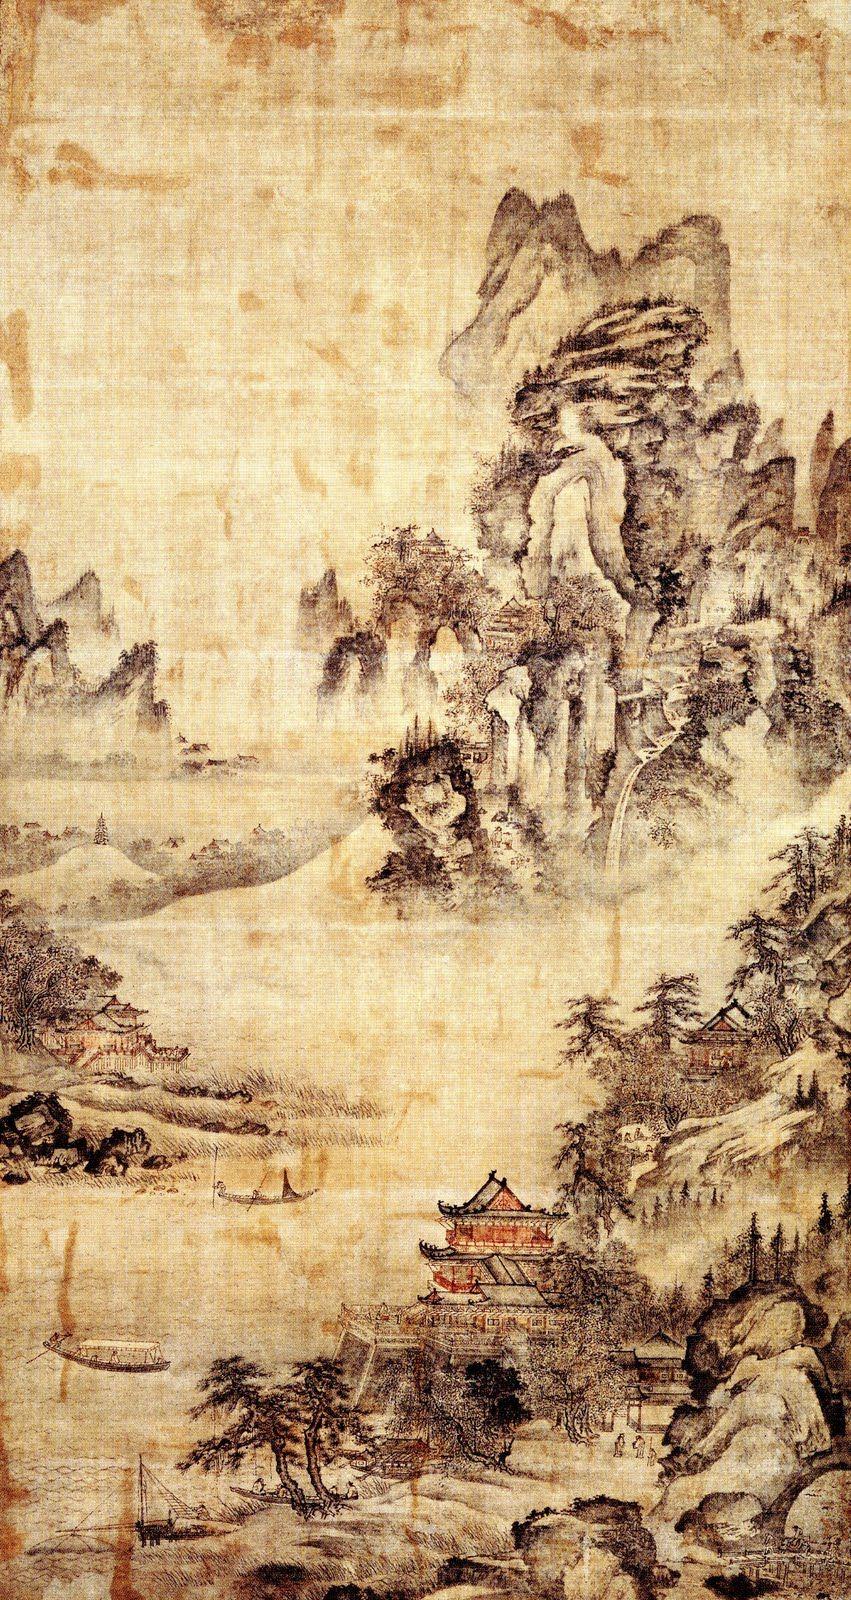 Joseon Dynasty Painting Korean Painting Korean Art Chinese Art